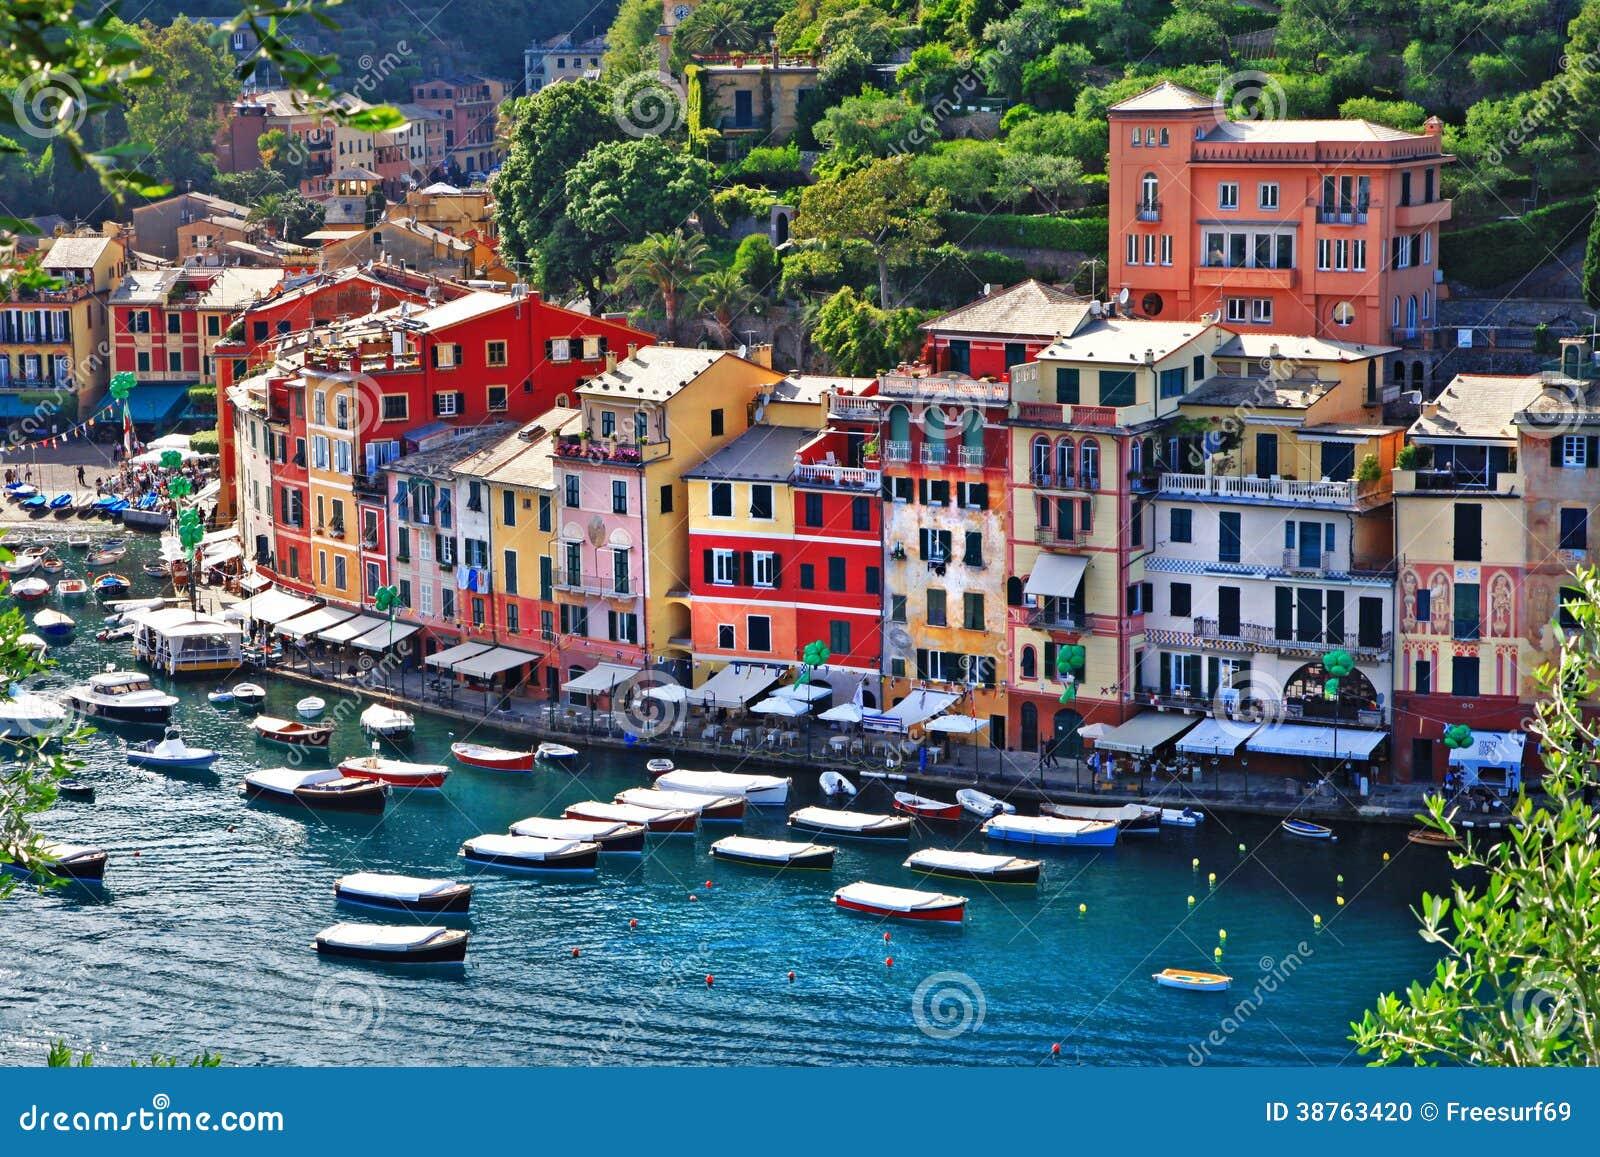 Luxury Portofino, Liguria